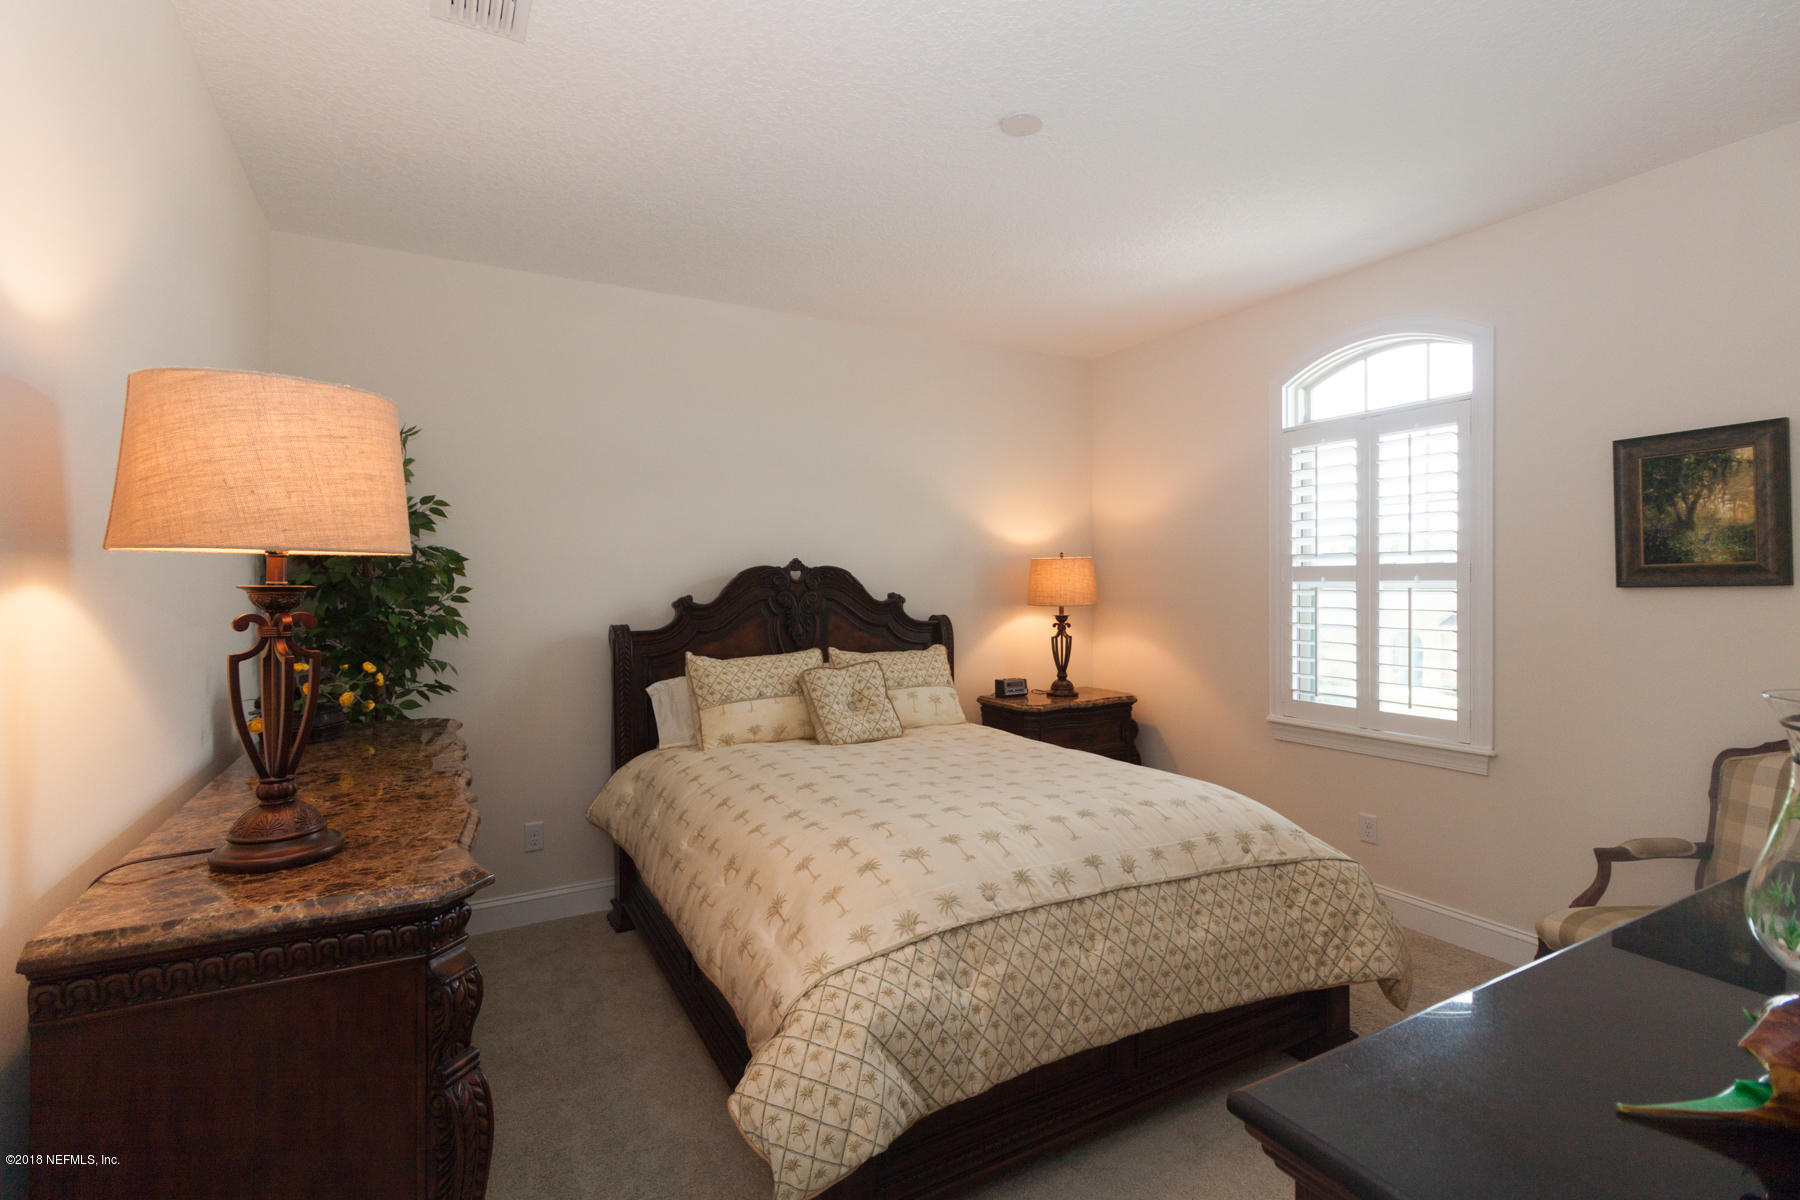 14954 VENOSA, JACKSONVILLE, FLORIDA 32258, 3 Bedrooms Bedrooms, ,3 BathroomsBathrooms,Residential - single family,For sale,VENOSA,924428